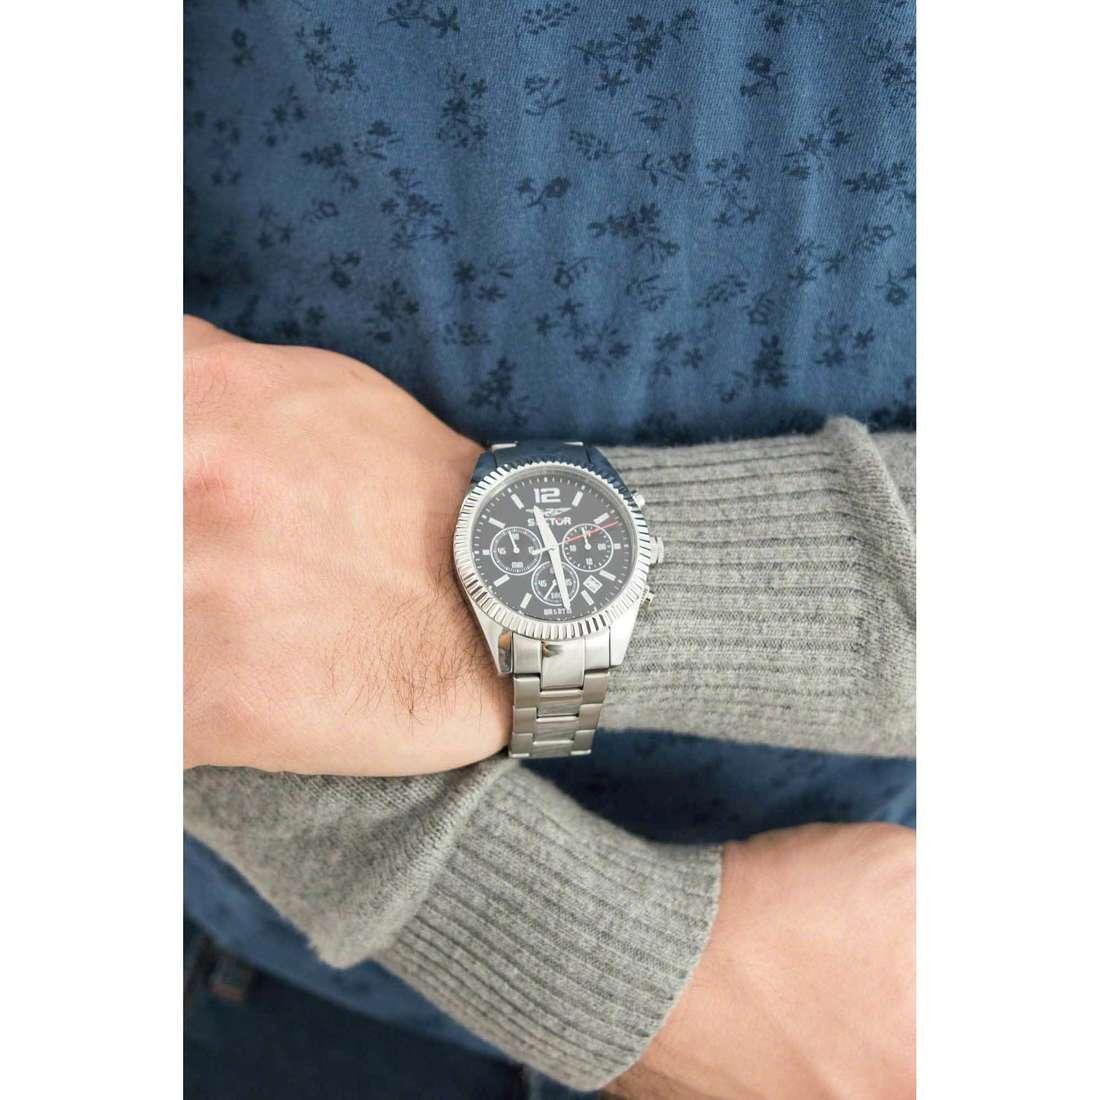 Sector cronografi uomo R3273676003 indosso